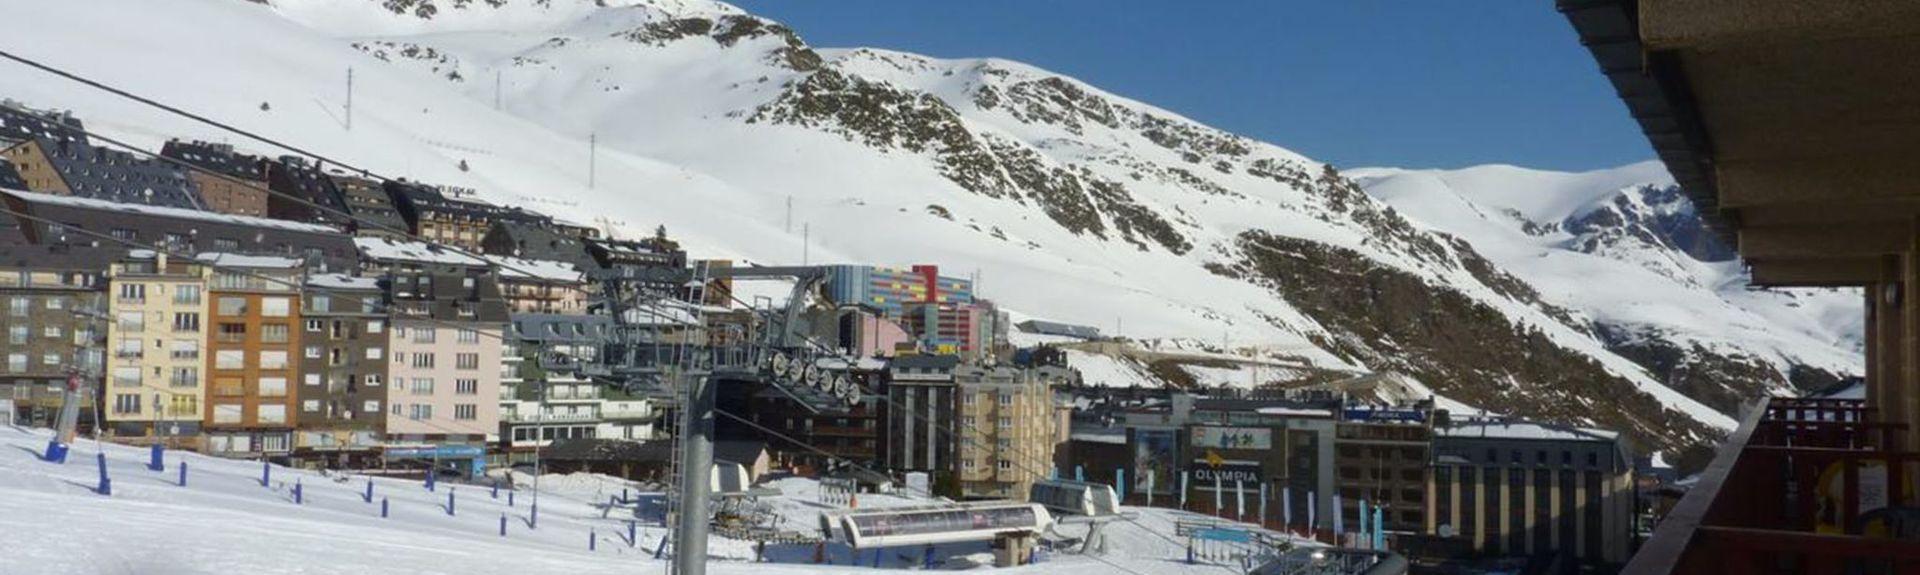 Arcalis Ski Resort, Arcalís, Ordino, Andorra